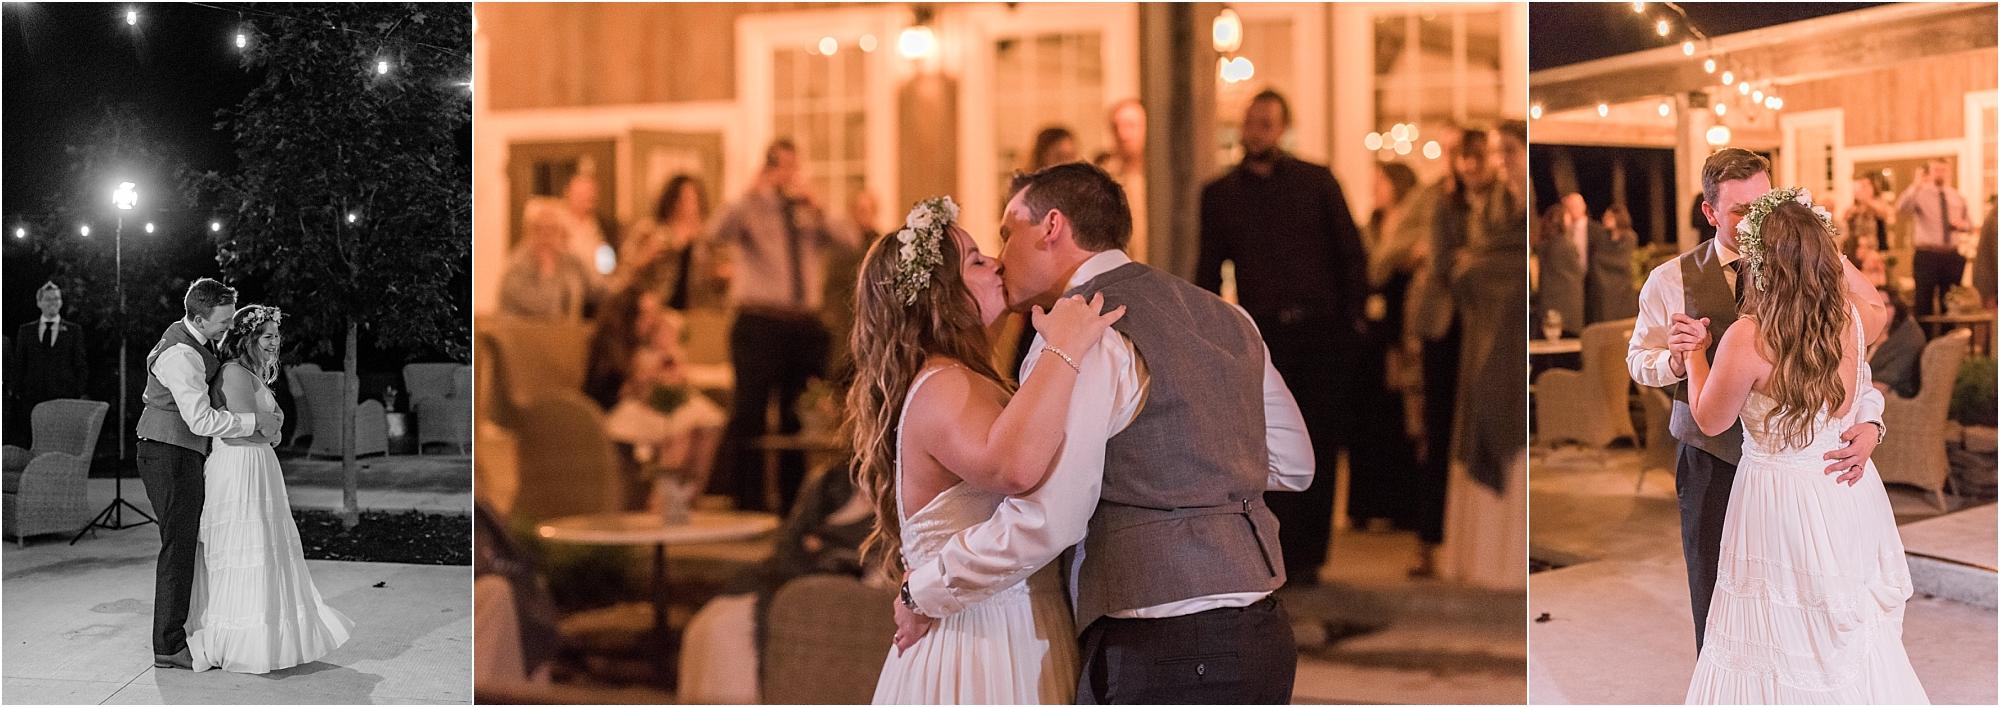 0099 Summer Stonefields Wedding Carleton Place - Ottawa Wedding - Photography by Emma_WEB.jpg